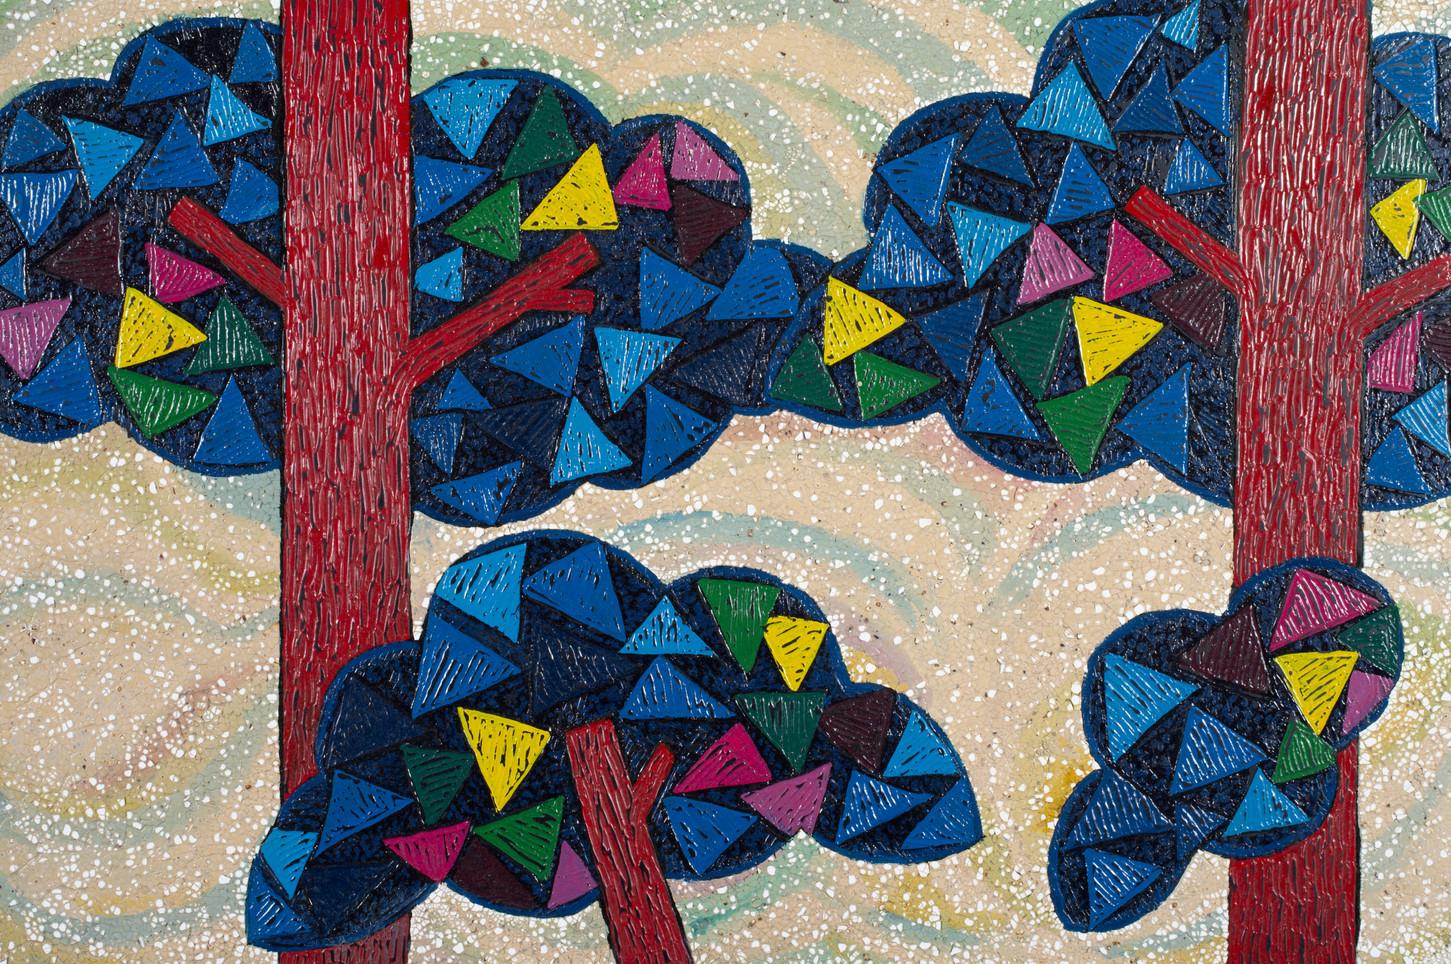 Young Sil Lee, Summer Tree in TongDoSa, 60x40cm, Koren painting